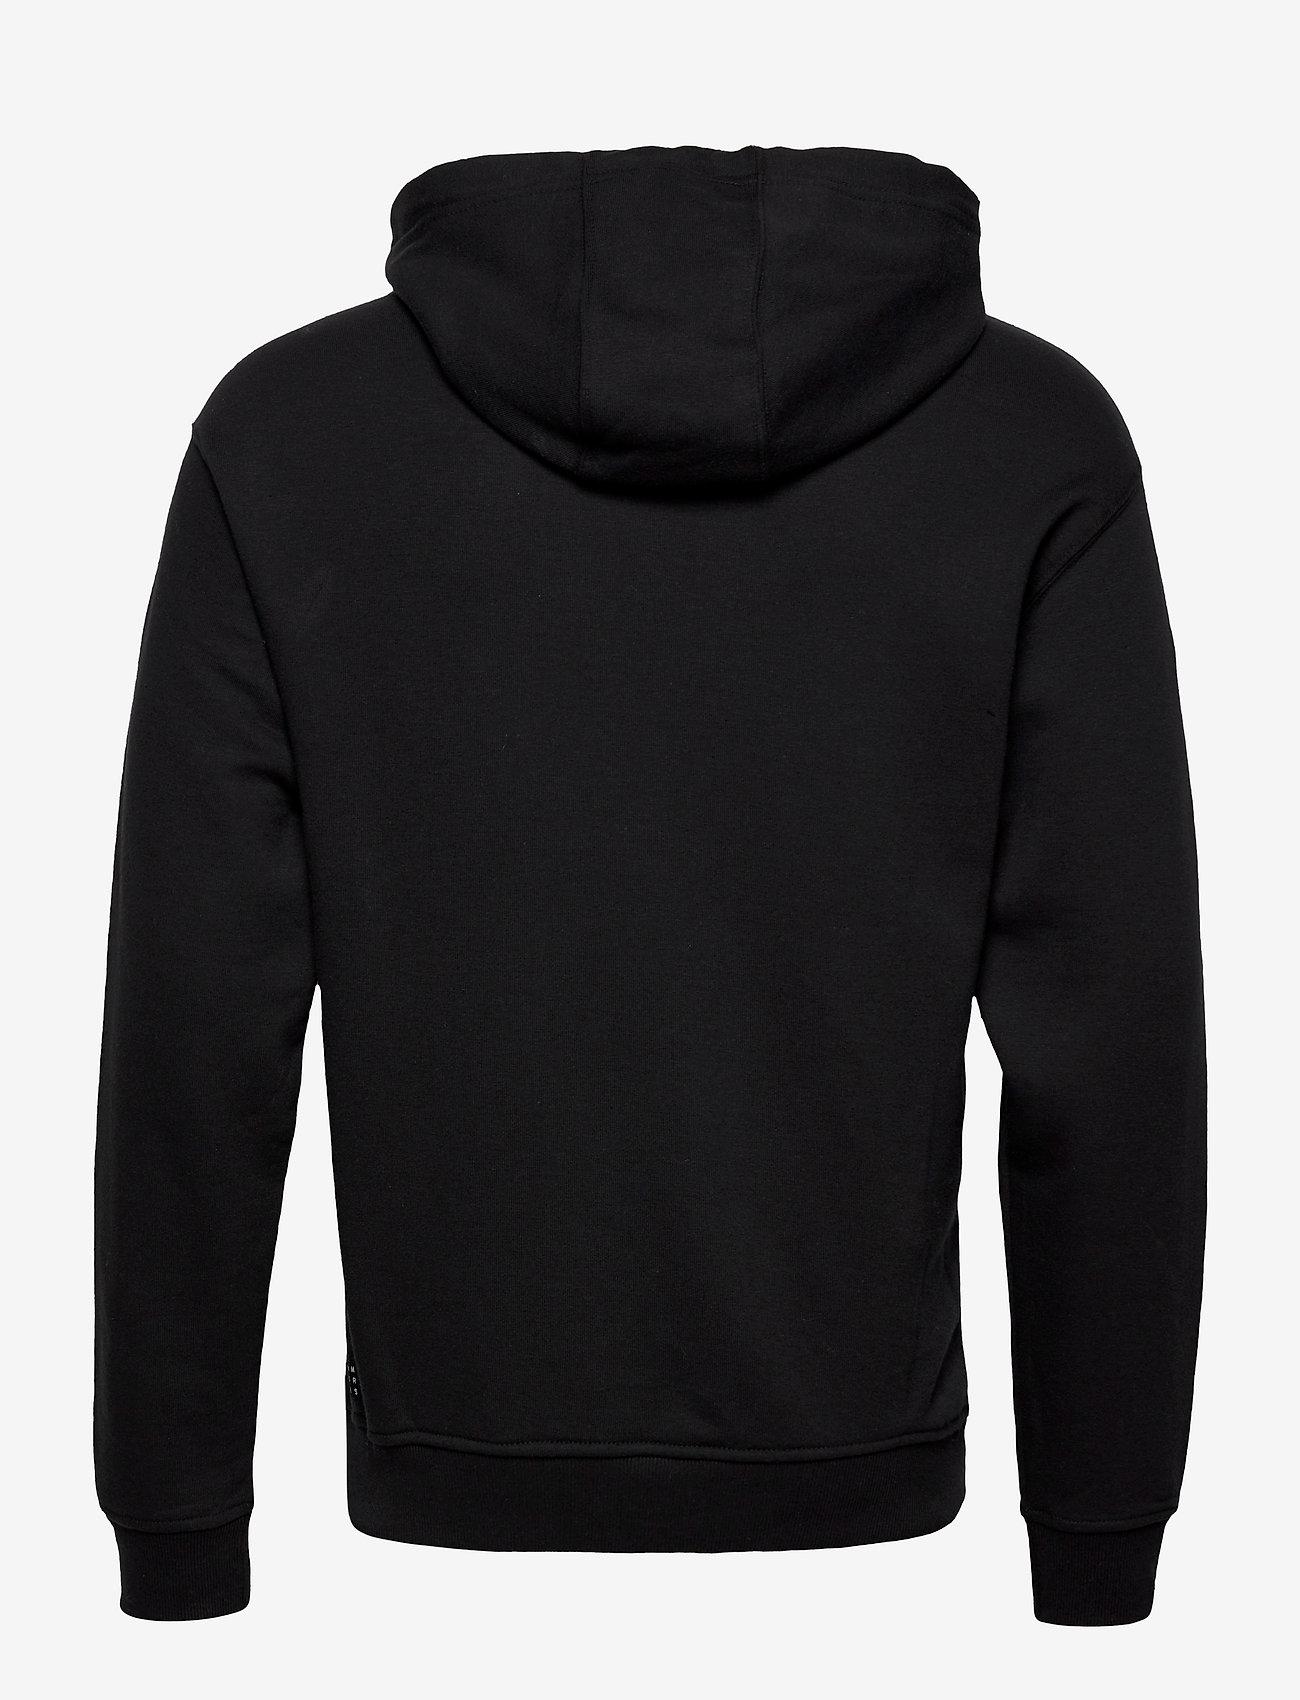 Blend Sweatshirt - Sweatshirts BLACK - Menn Klær